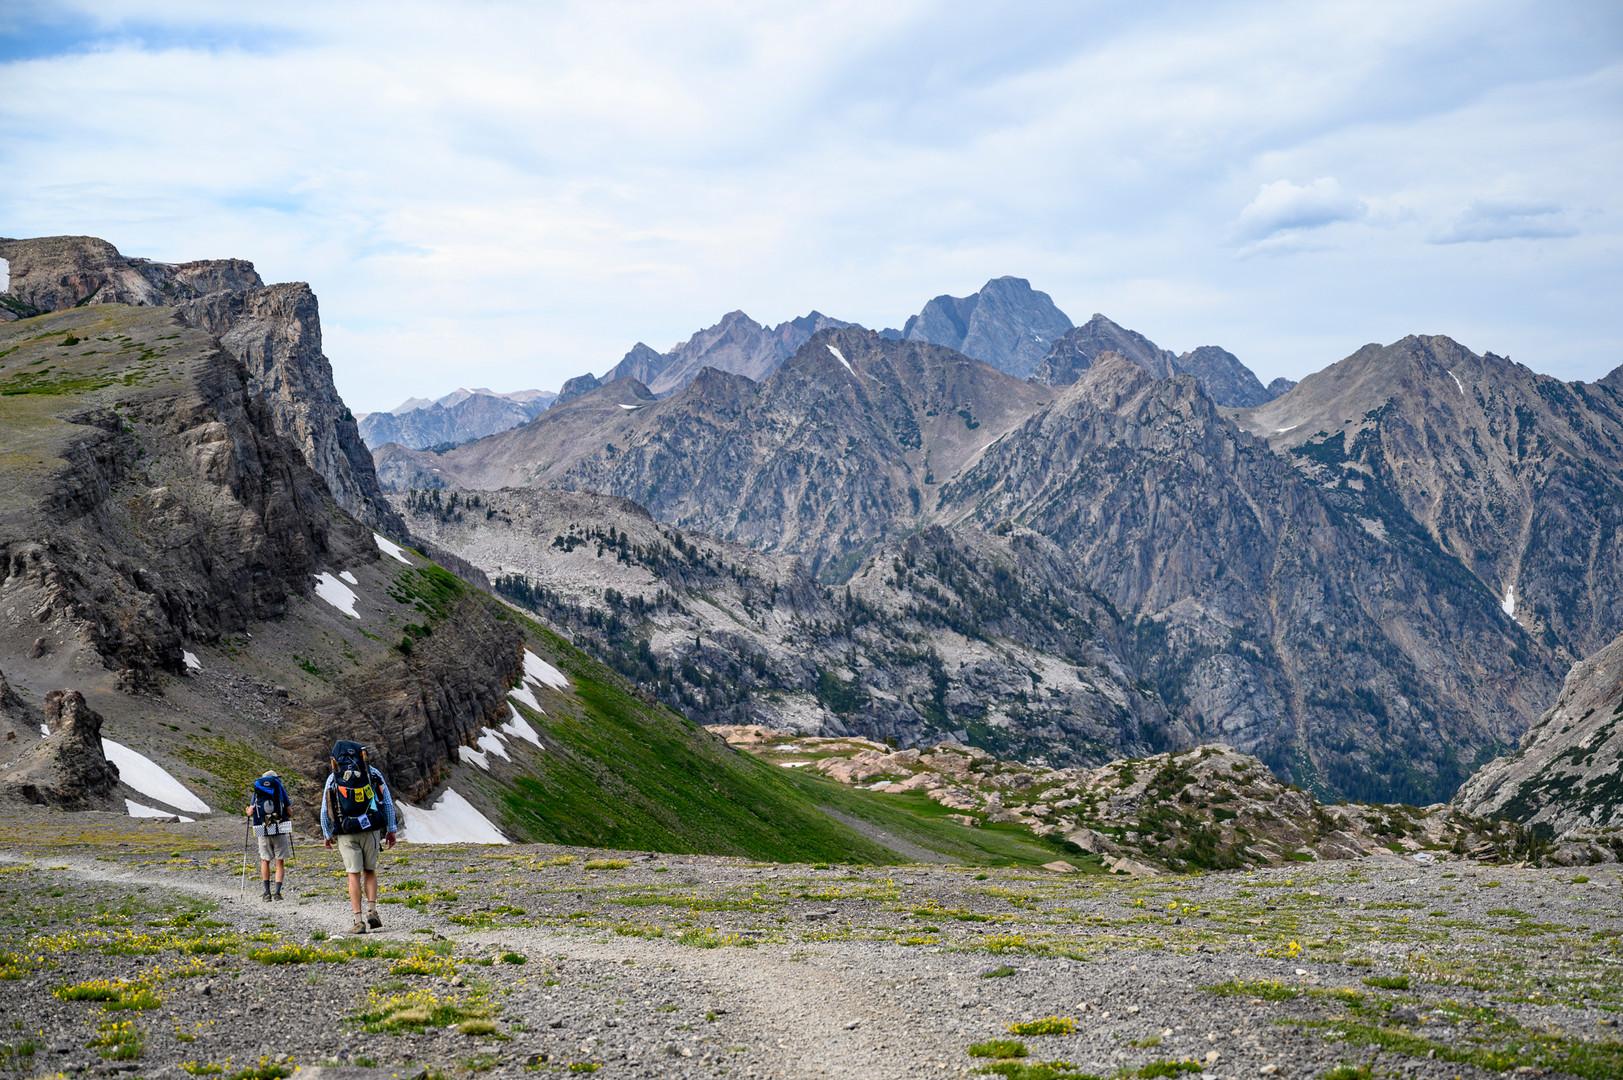 Teton Crest Trail in Grand Teton National Park, Wyoming (through hike)